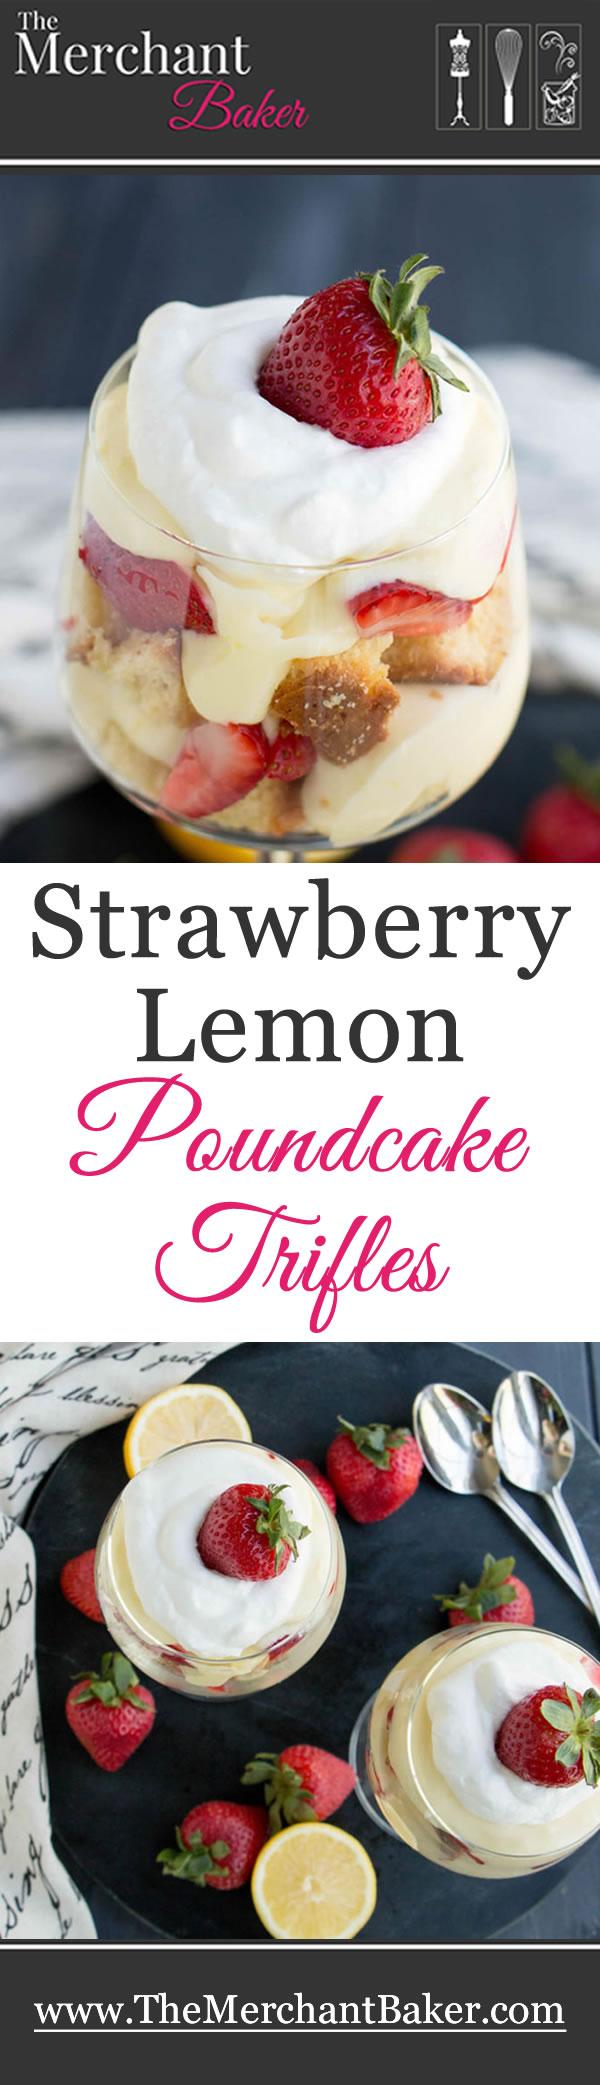 Strawberry Lemon Pound Cake Trifles | Recipe | Pound cake ...